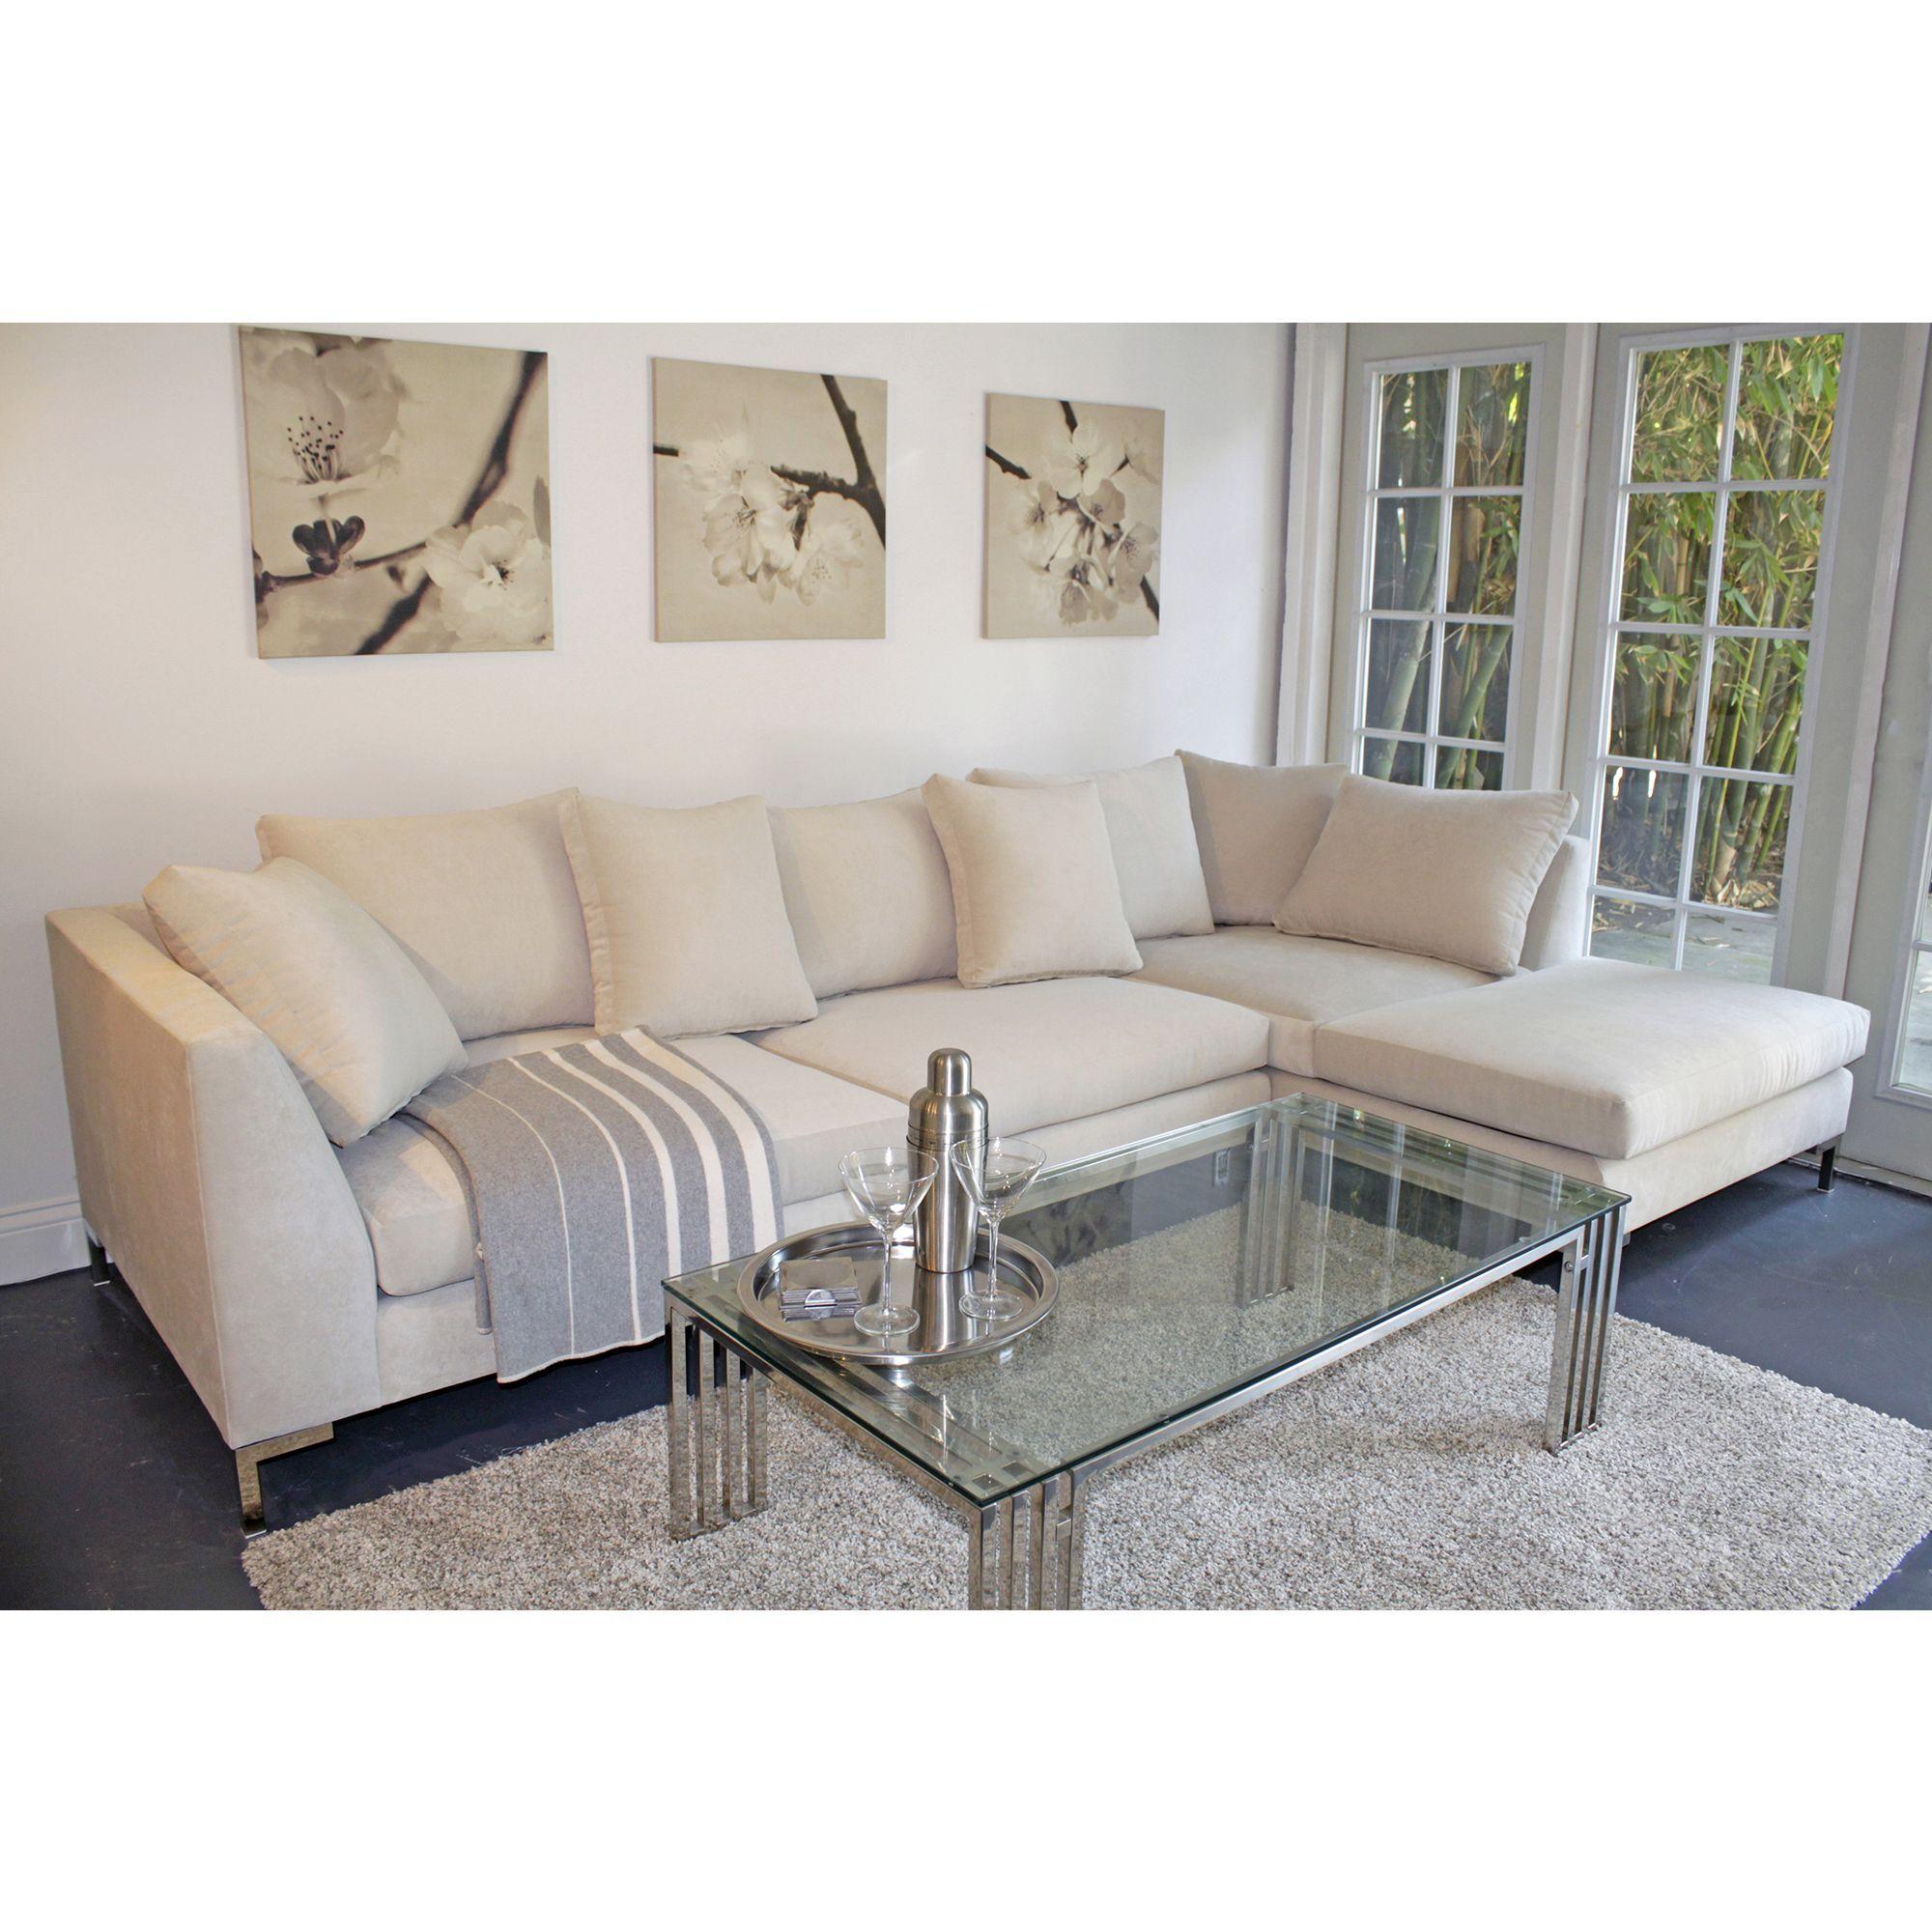 Decenni Custom Furniture U0027Divinau0027 Bone Modern Sectional Sofa   Overstock™  Shopping   The Best Prices On Decenni Custom Furniture Sofas U0026 Loveseats